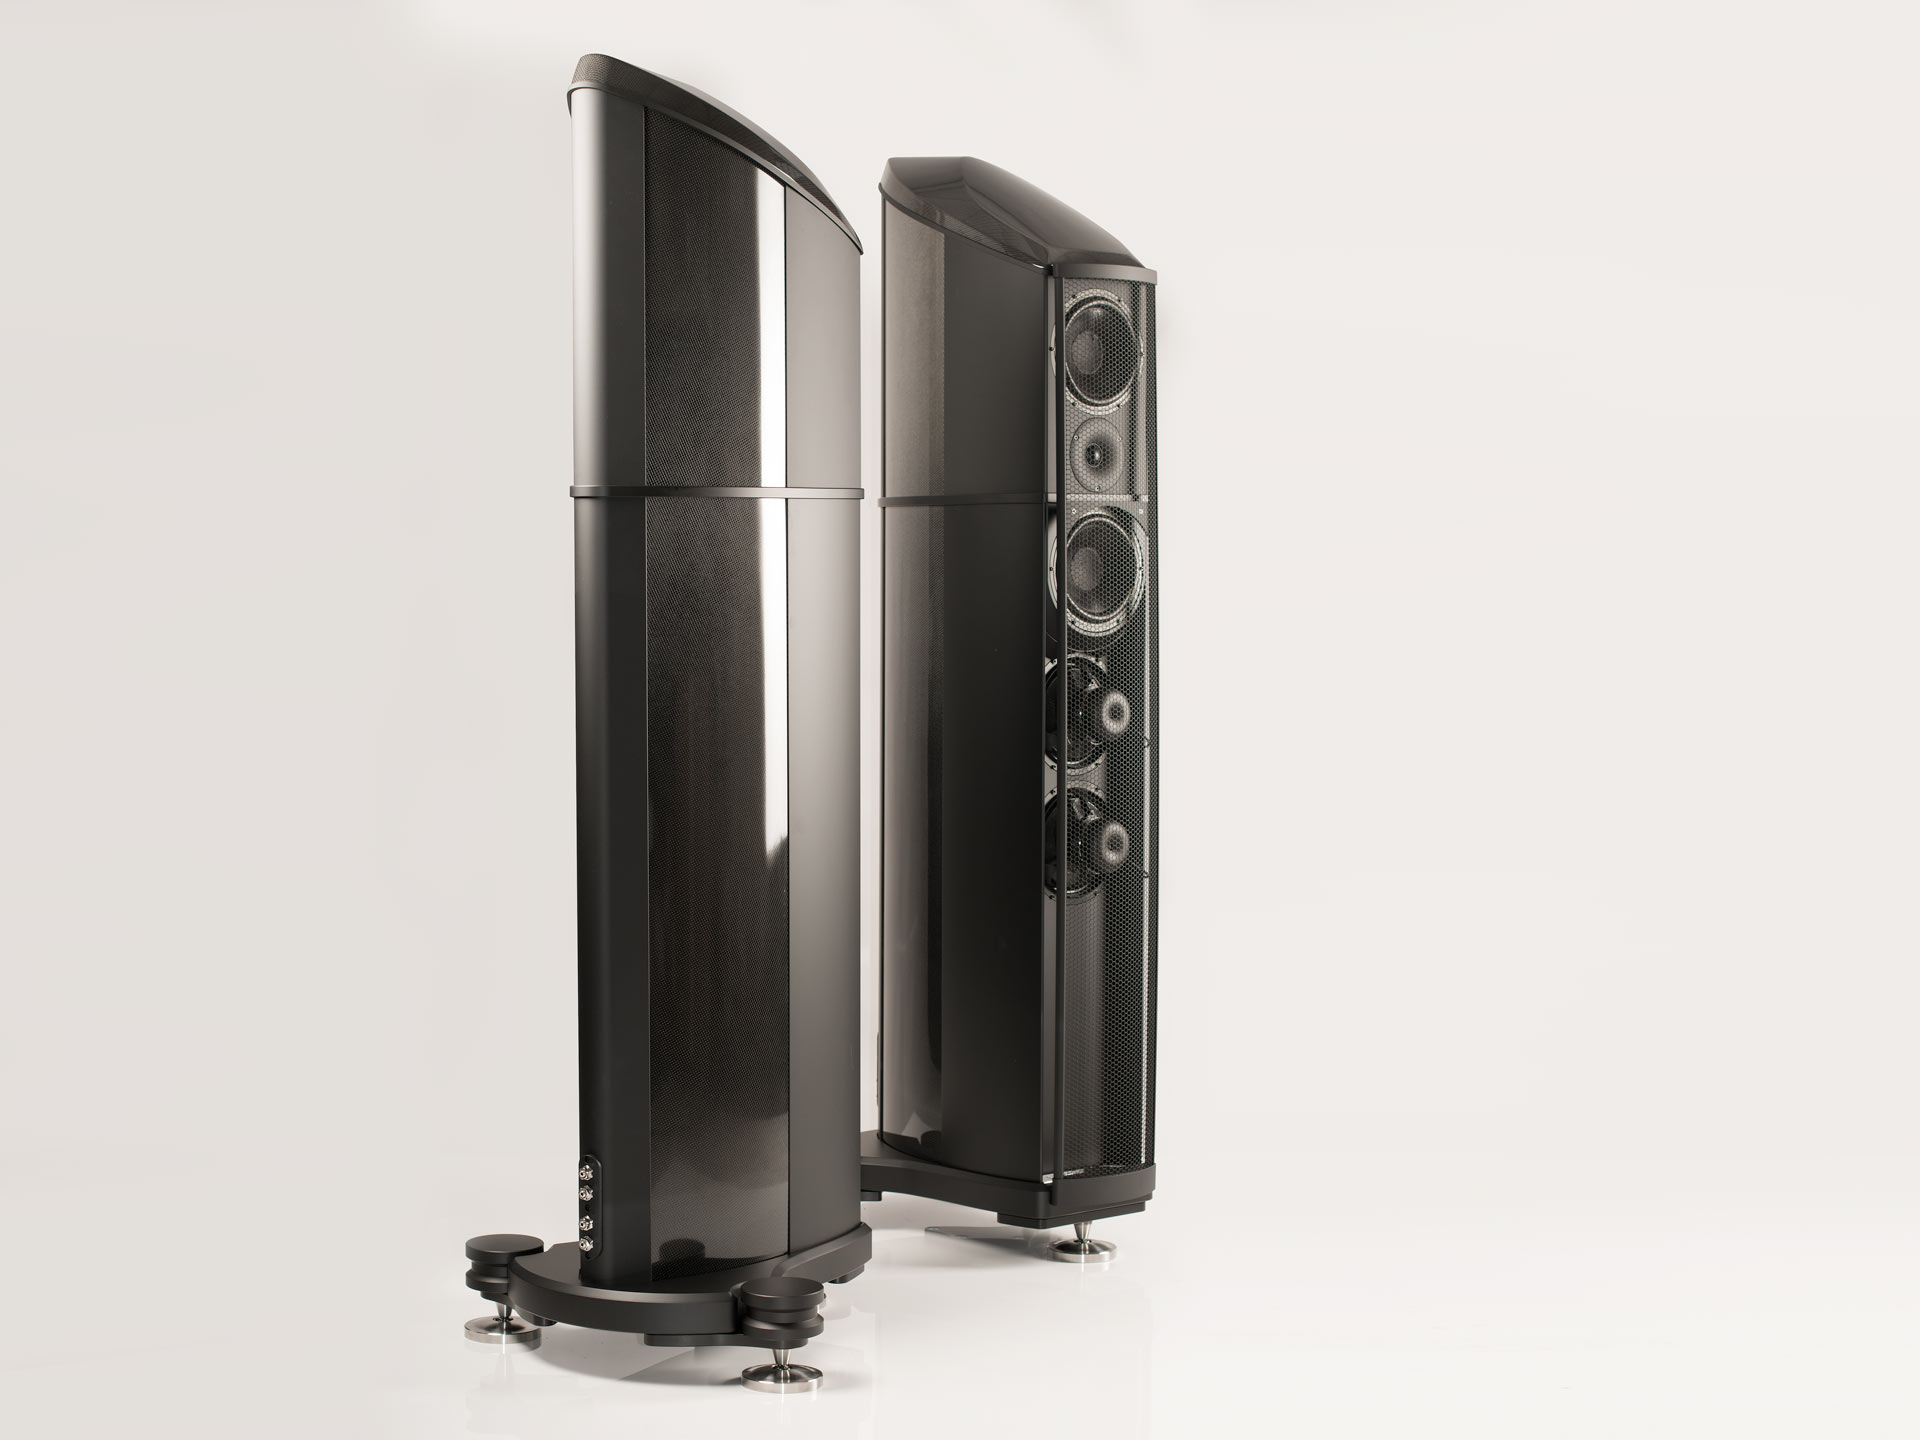 Wilson-Benesch-Geometry-Series-Resolution-floorstanding-loudspeaker-singularity-audio-5